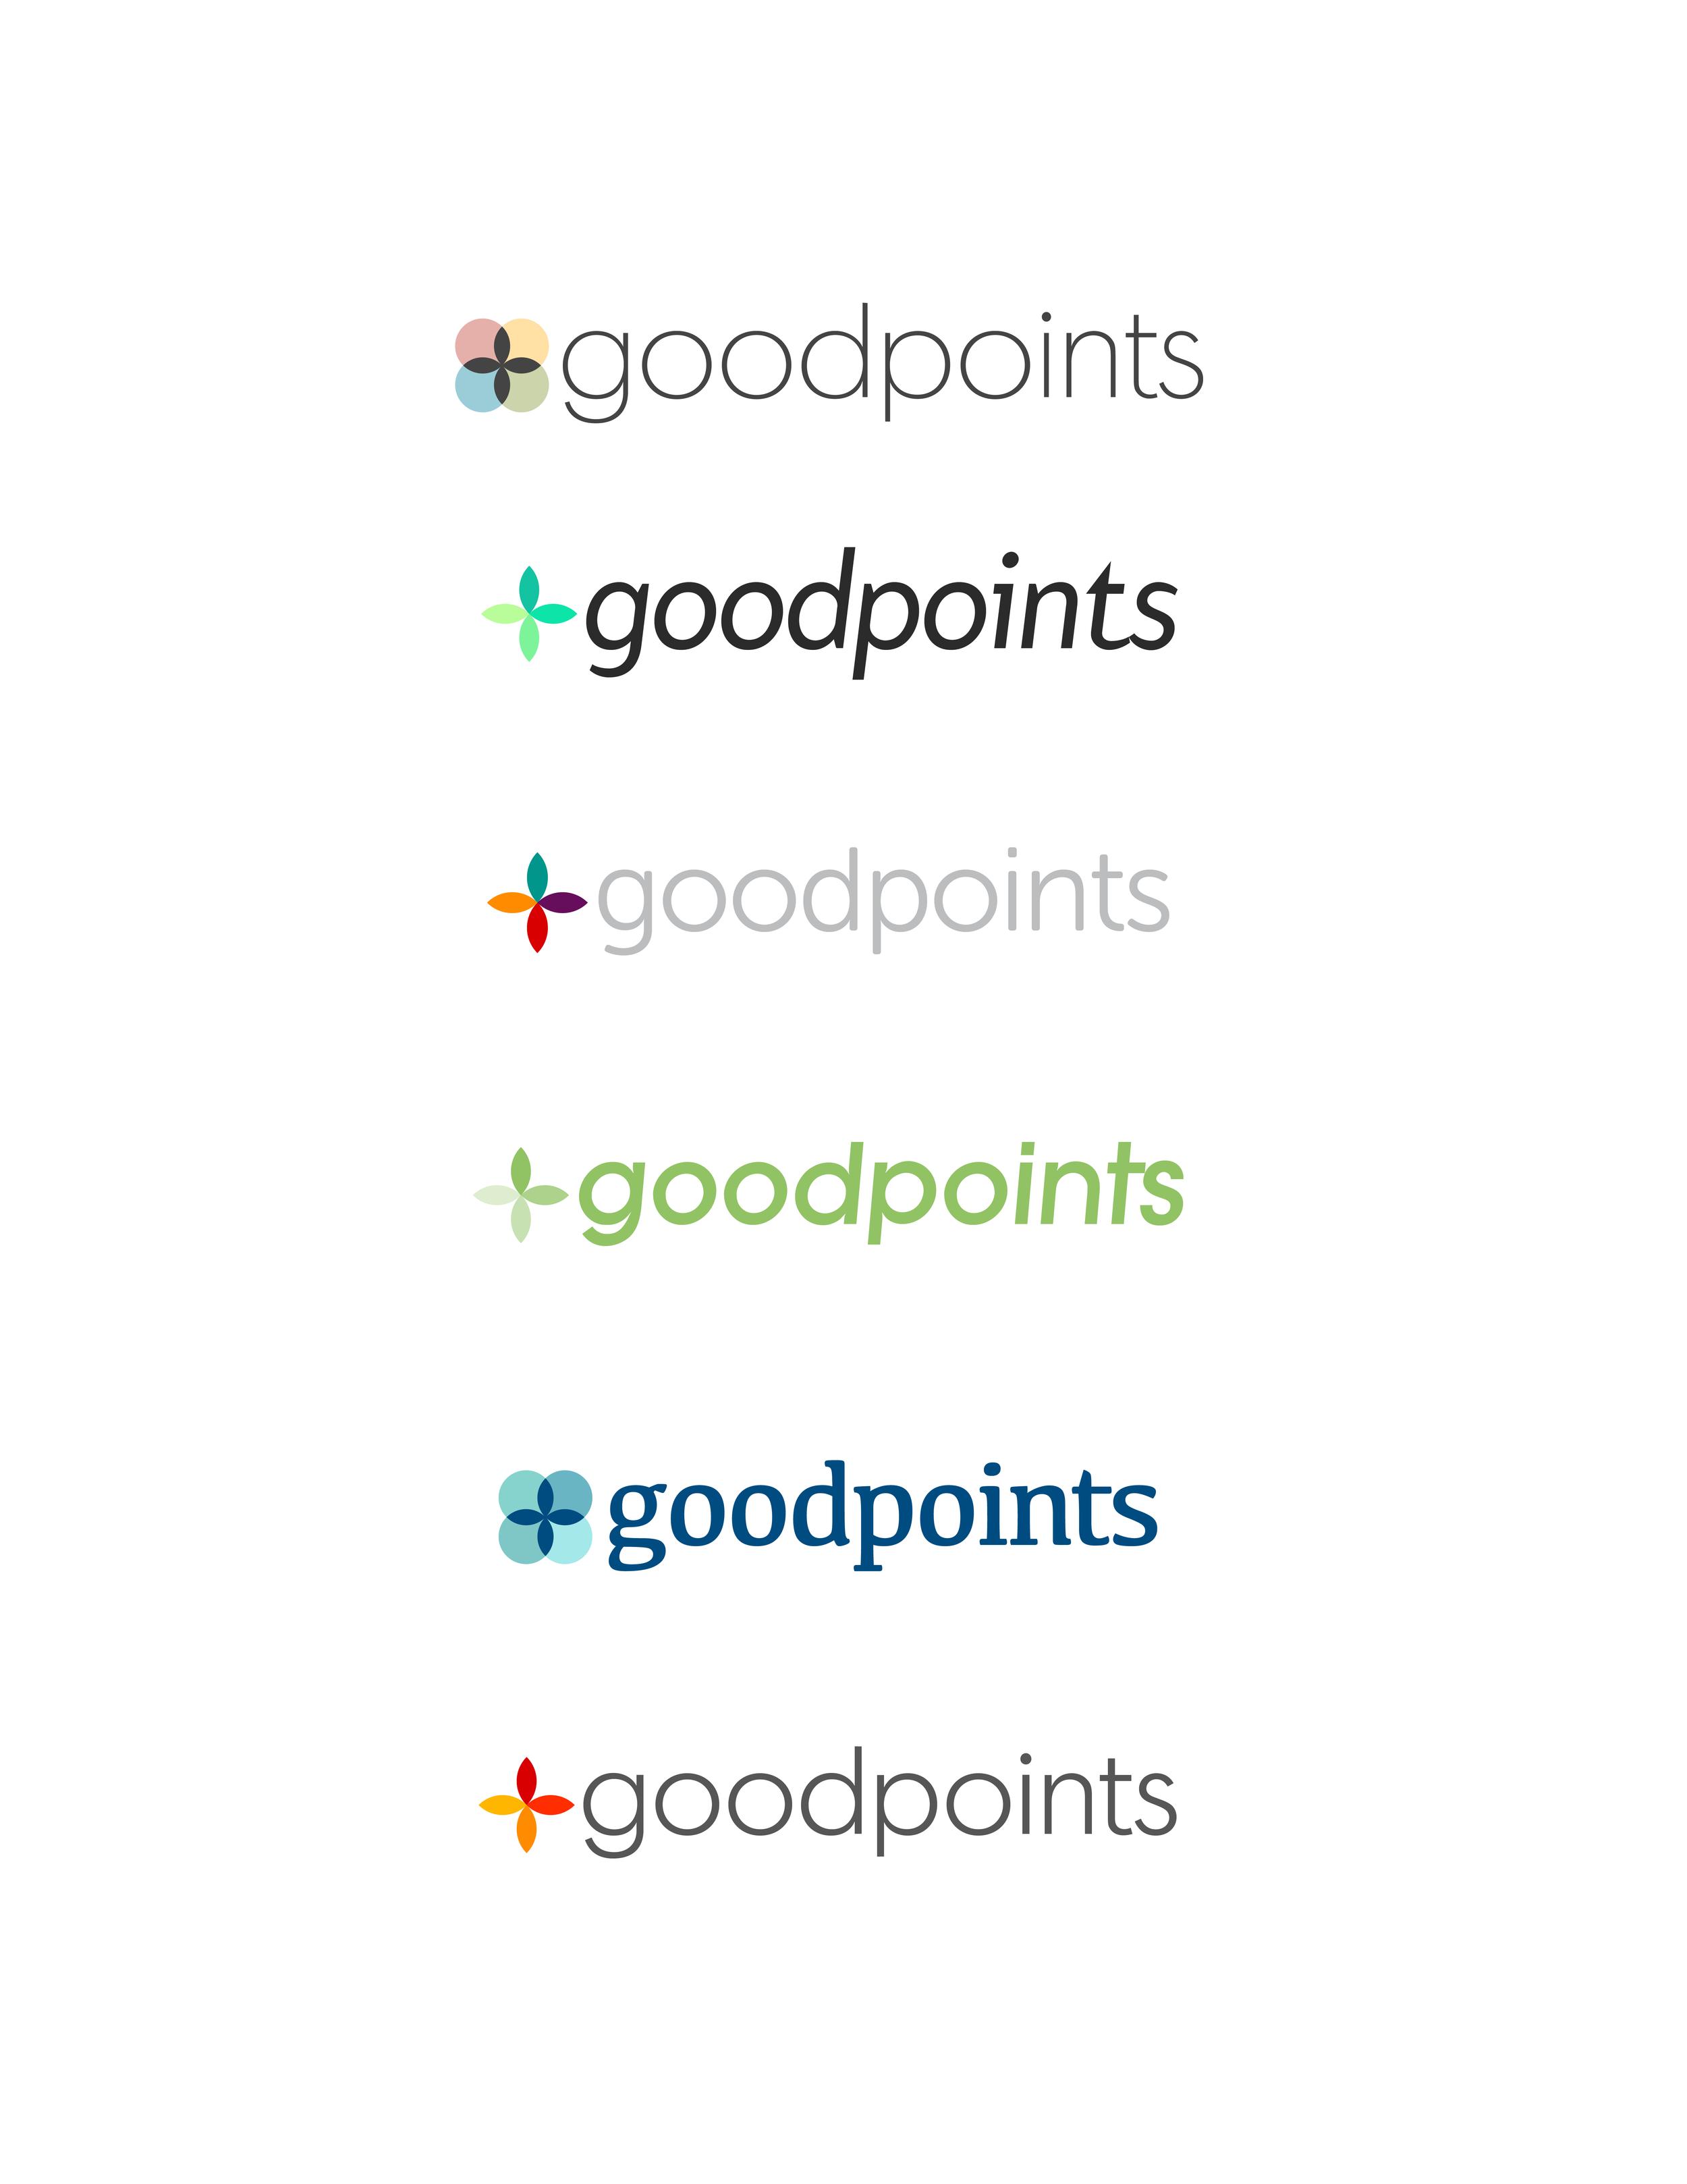 goodpoints_branding-02.png